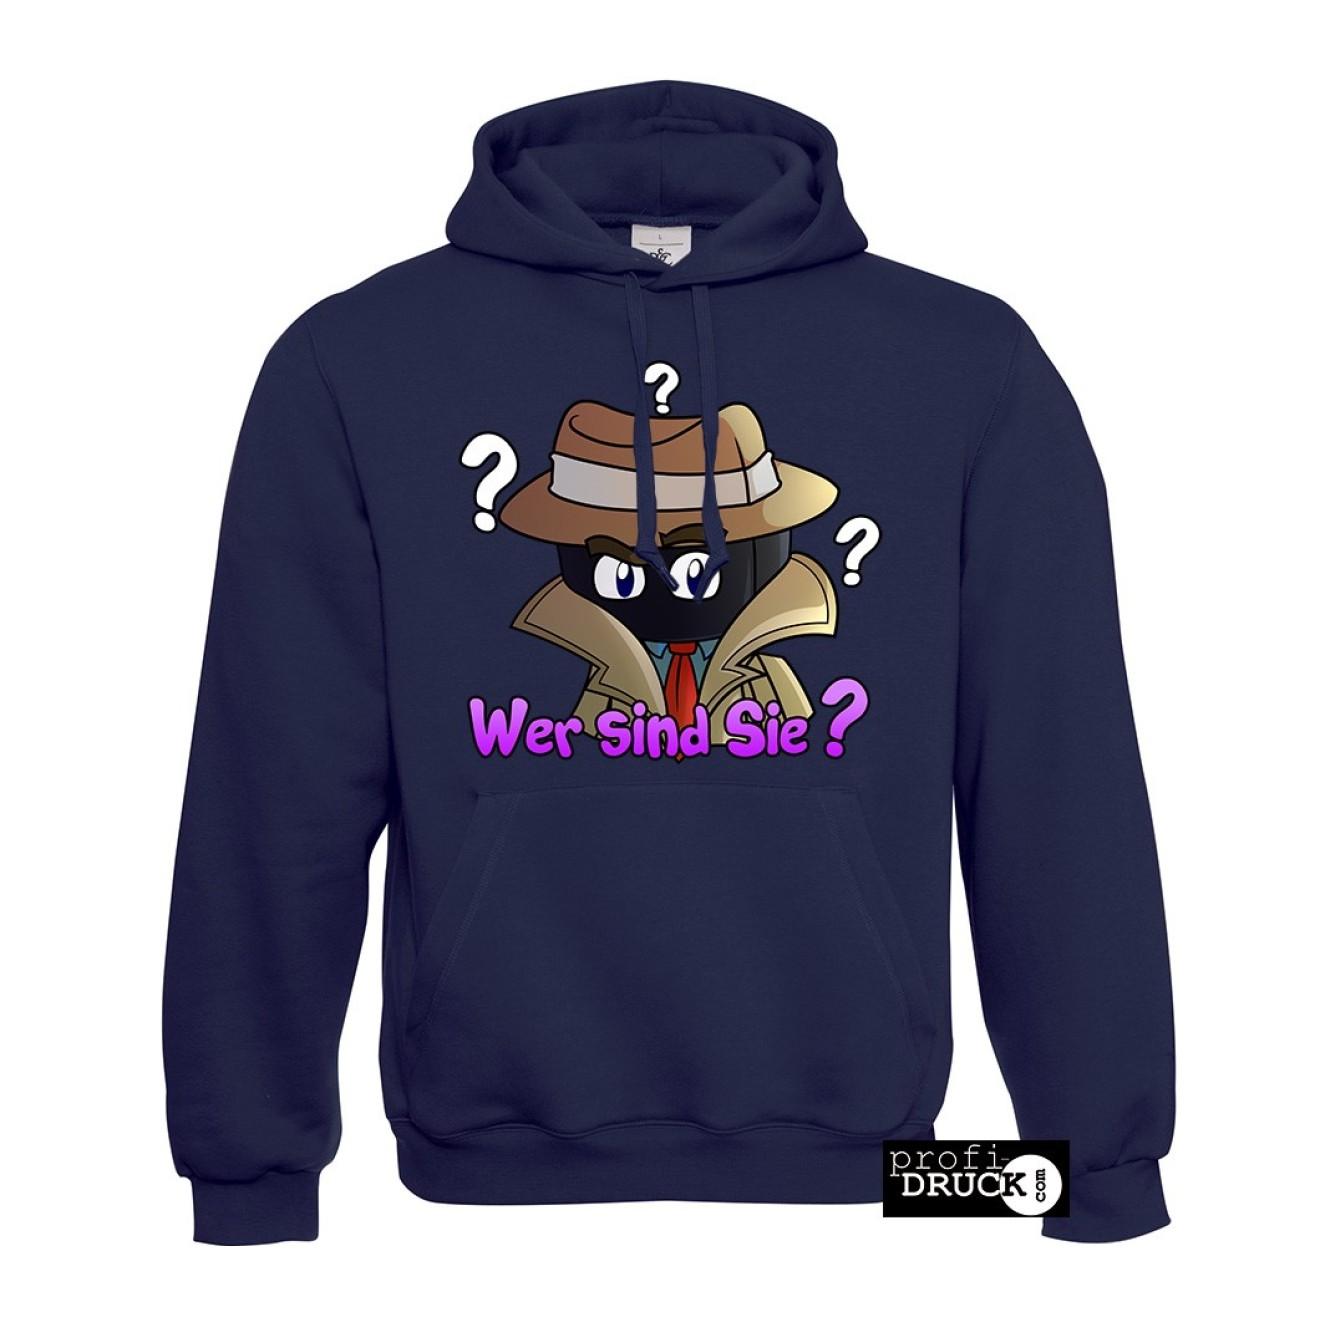 wer sind sie hoodie variante purple. Black Bedroom Furniture Sets. Home Design Ideas